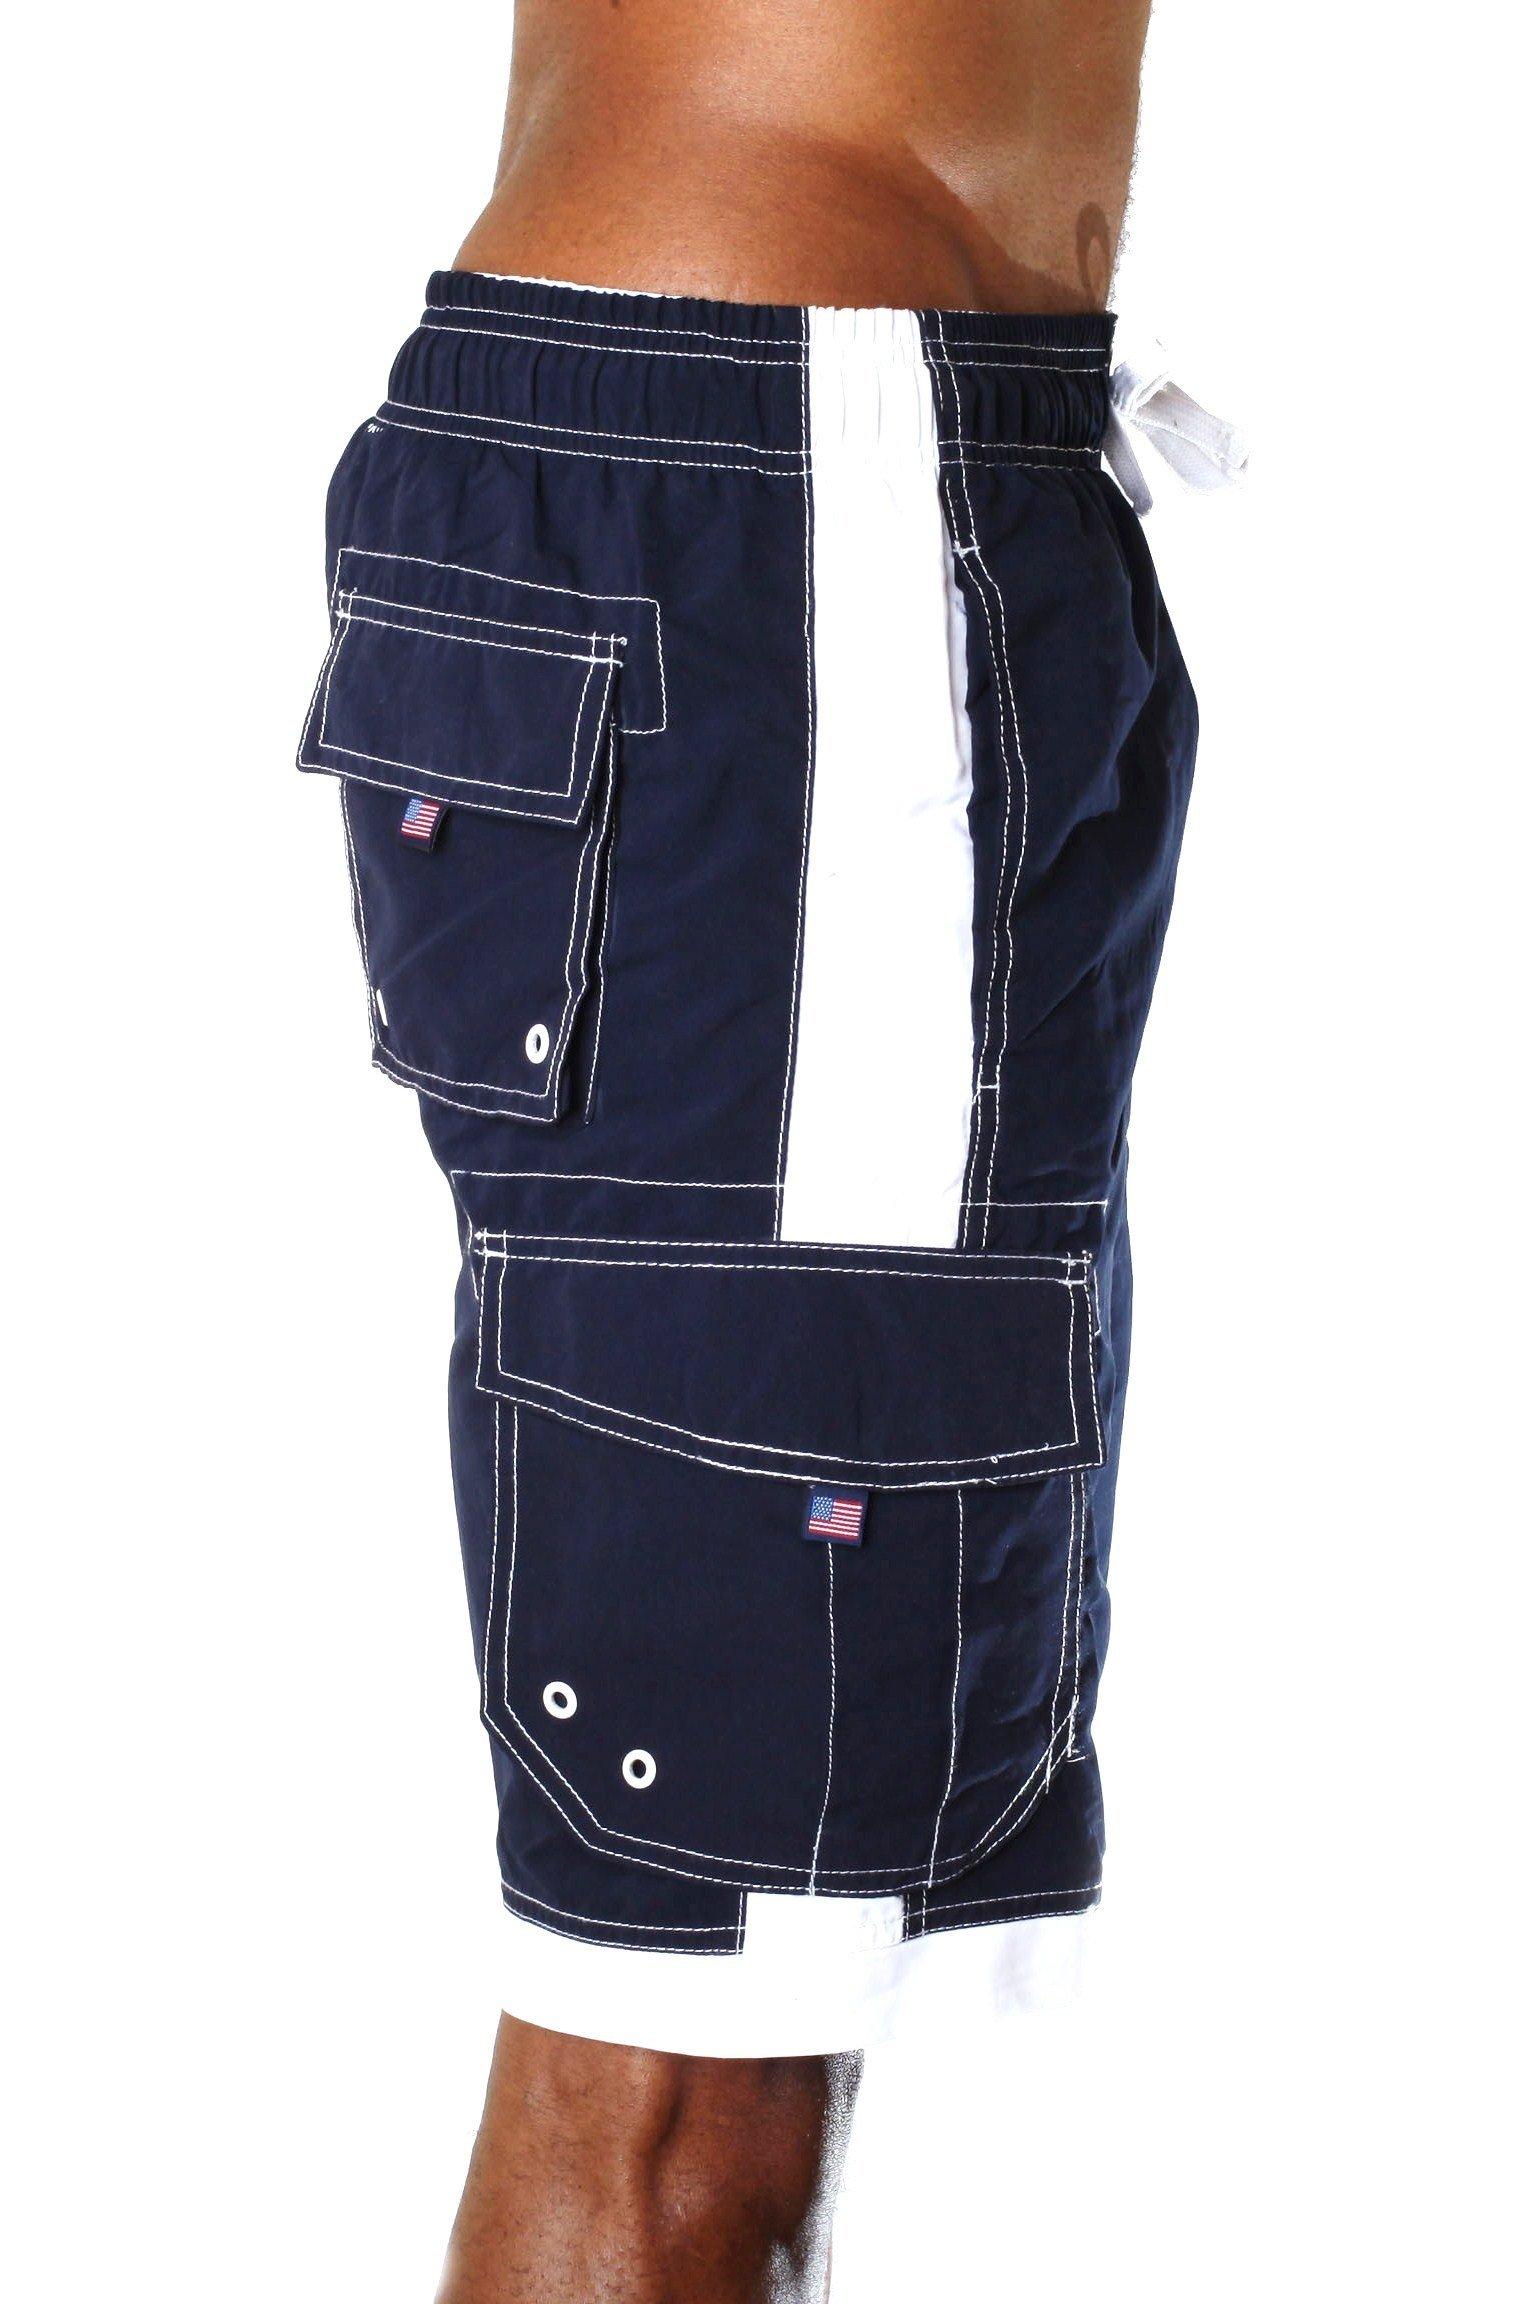 Alki'i Men's Boardshorts - Solid Colors Team USA, X-Large, Navy by Alki'i